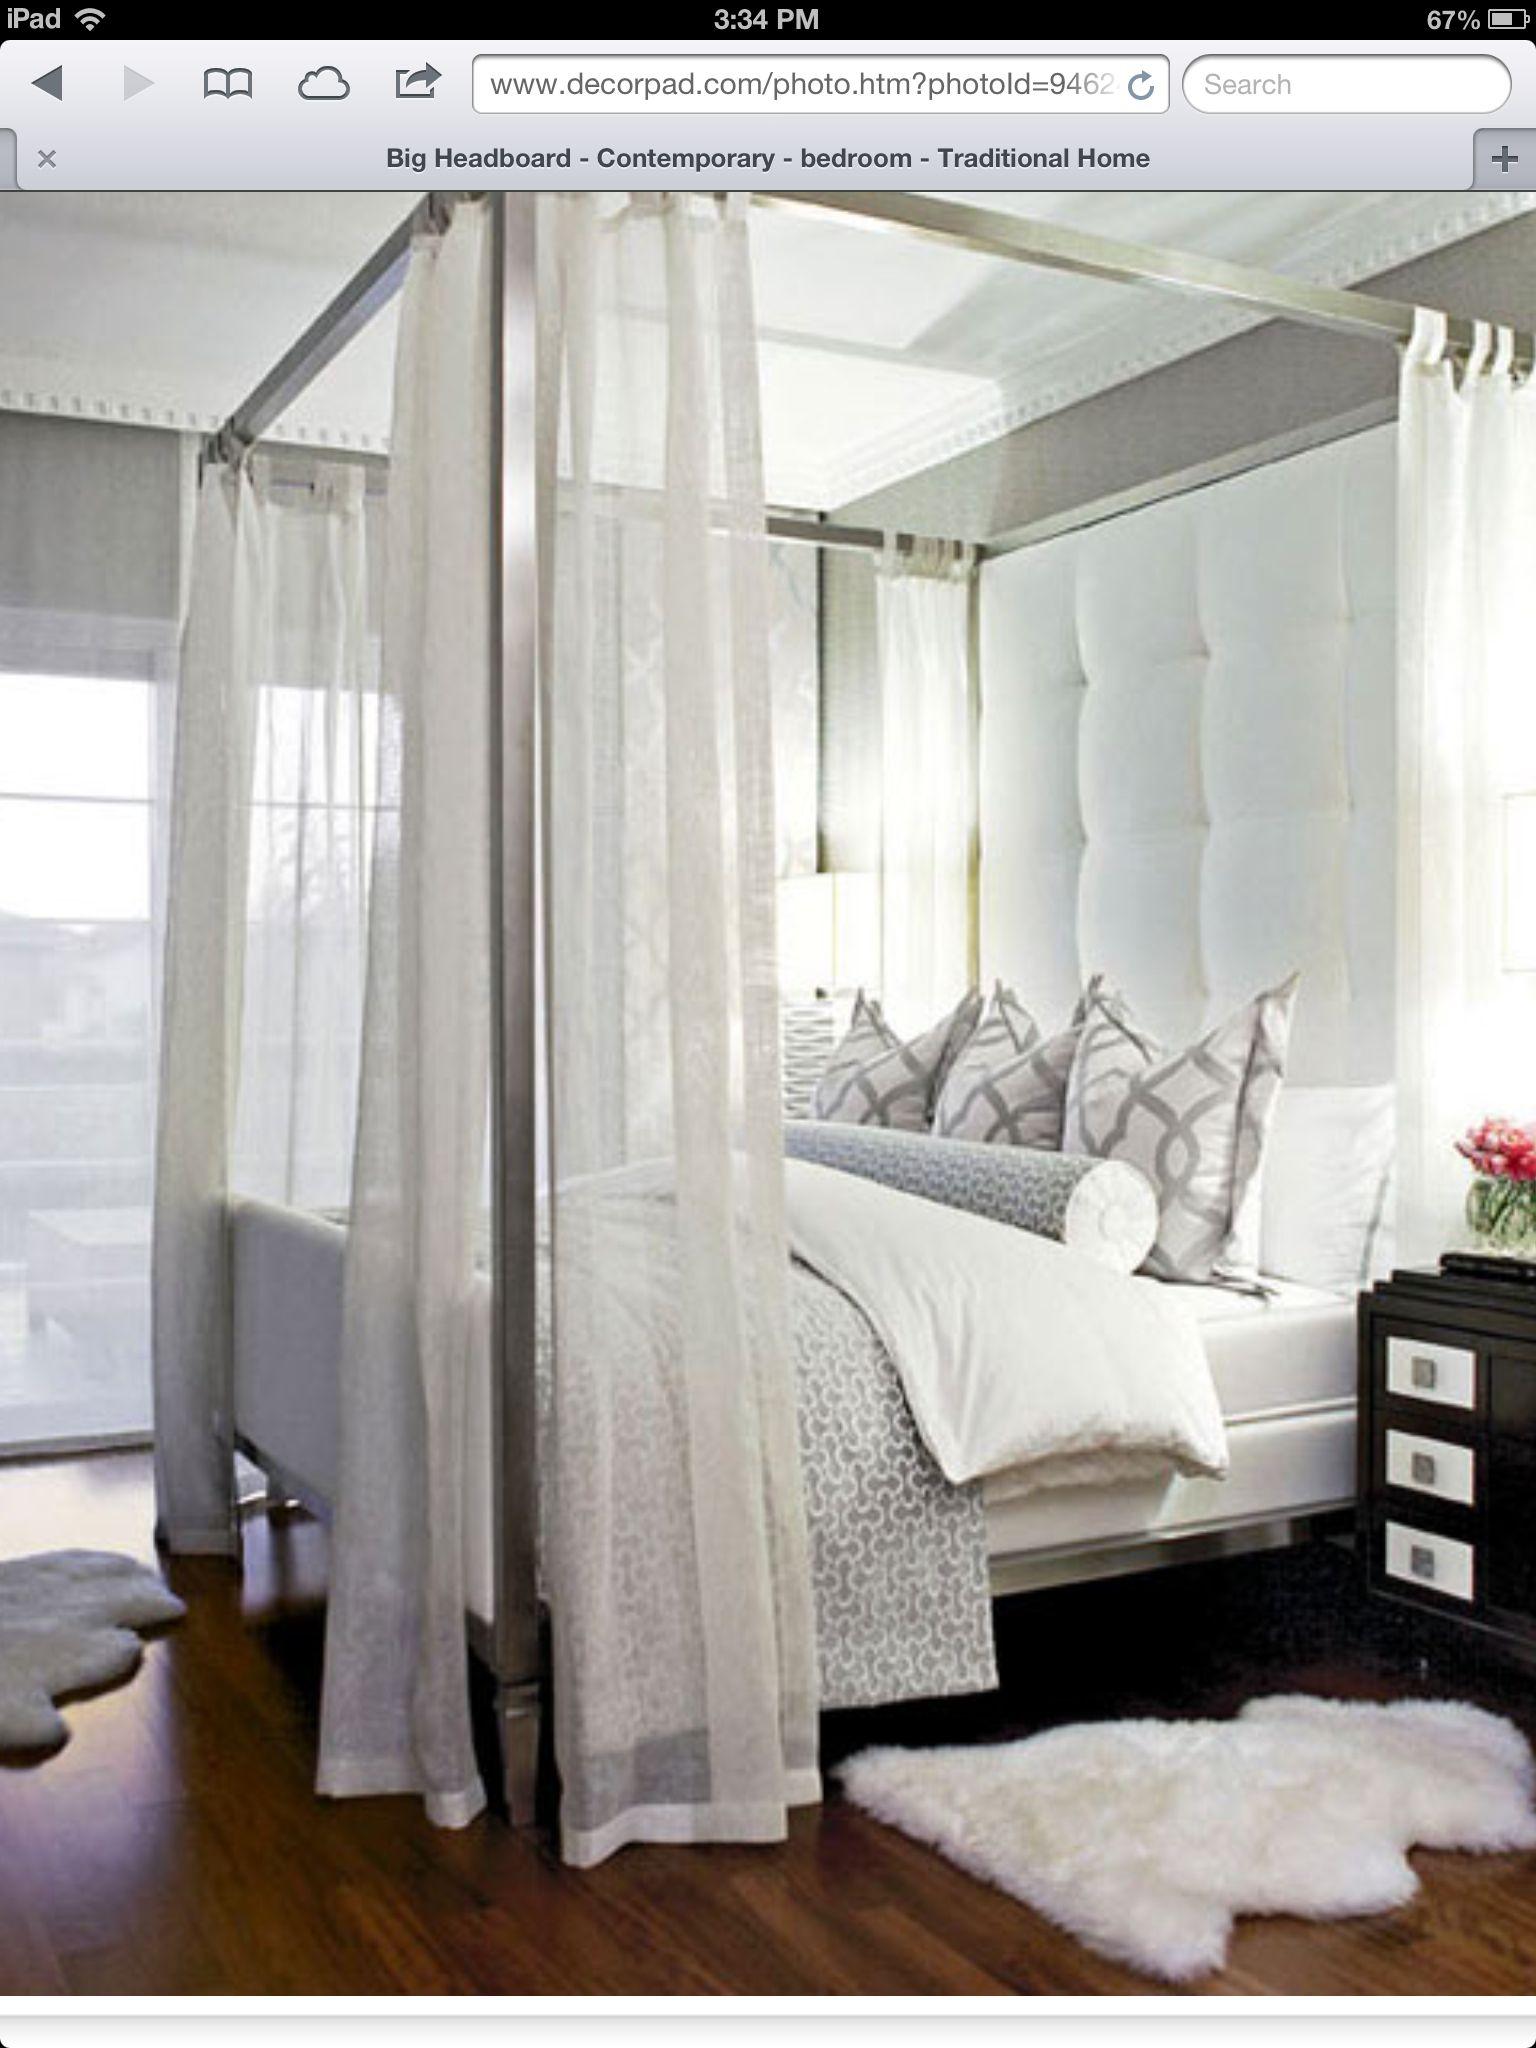 Traditional romantic master bedroom decor  Bedroom ideas  My new bedroom  Pinterest  Bedrooms Gray bedroom